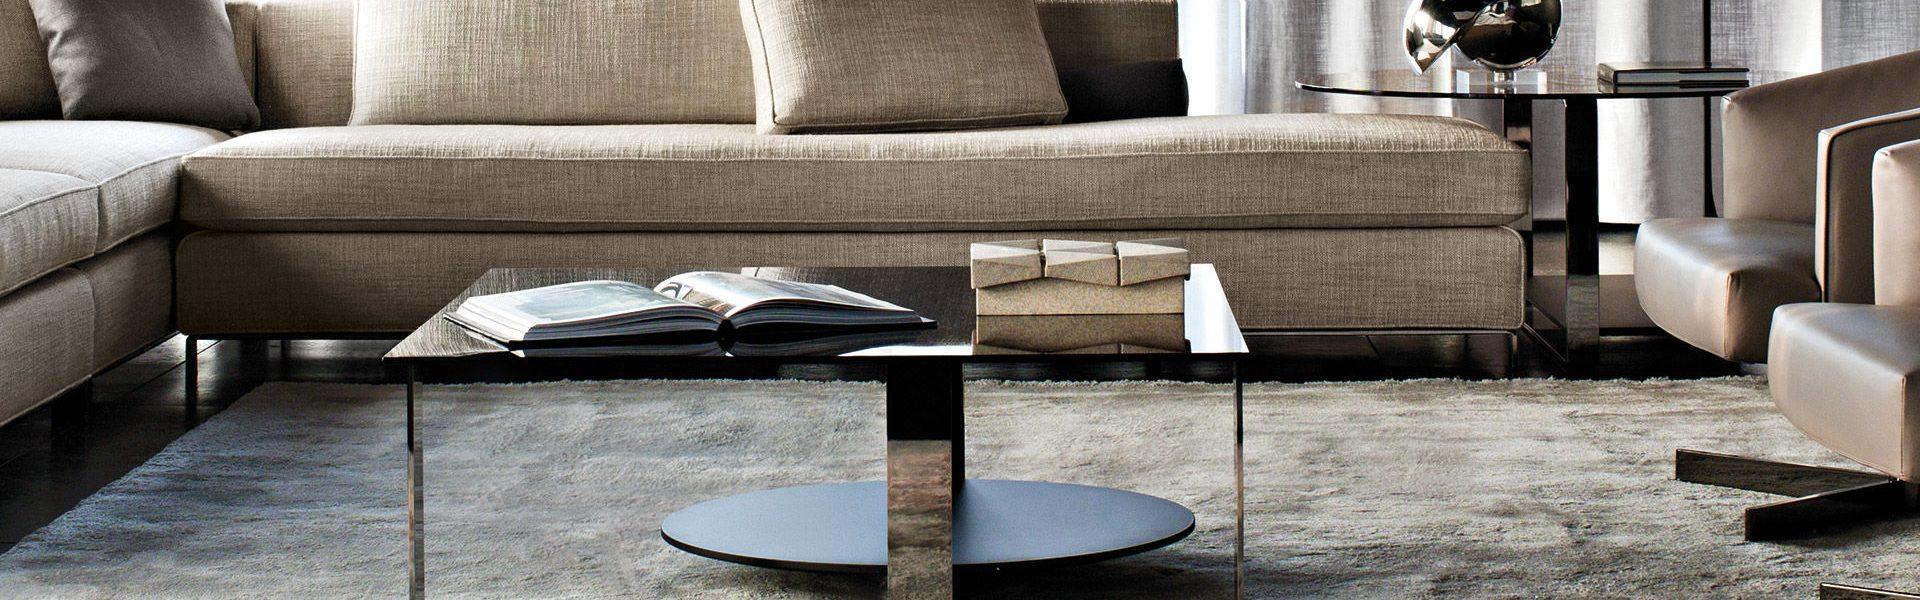 Bresson Coffee Table